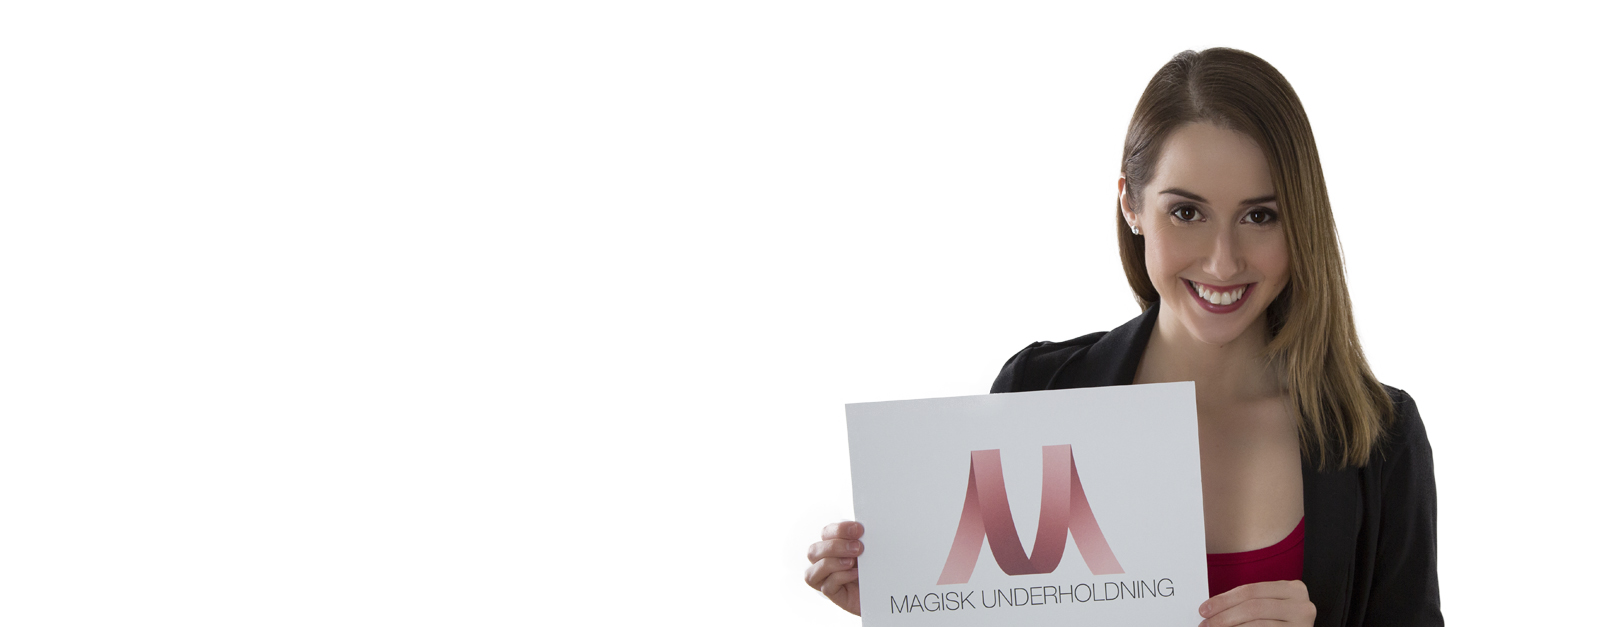 magiskunderholdning-testimonial2